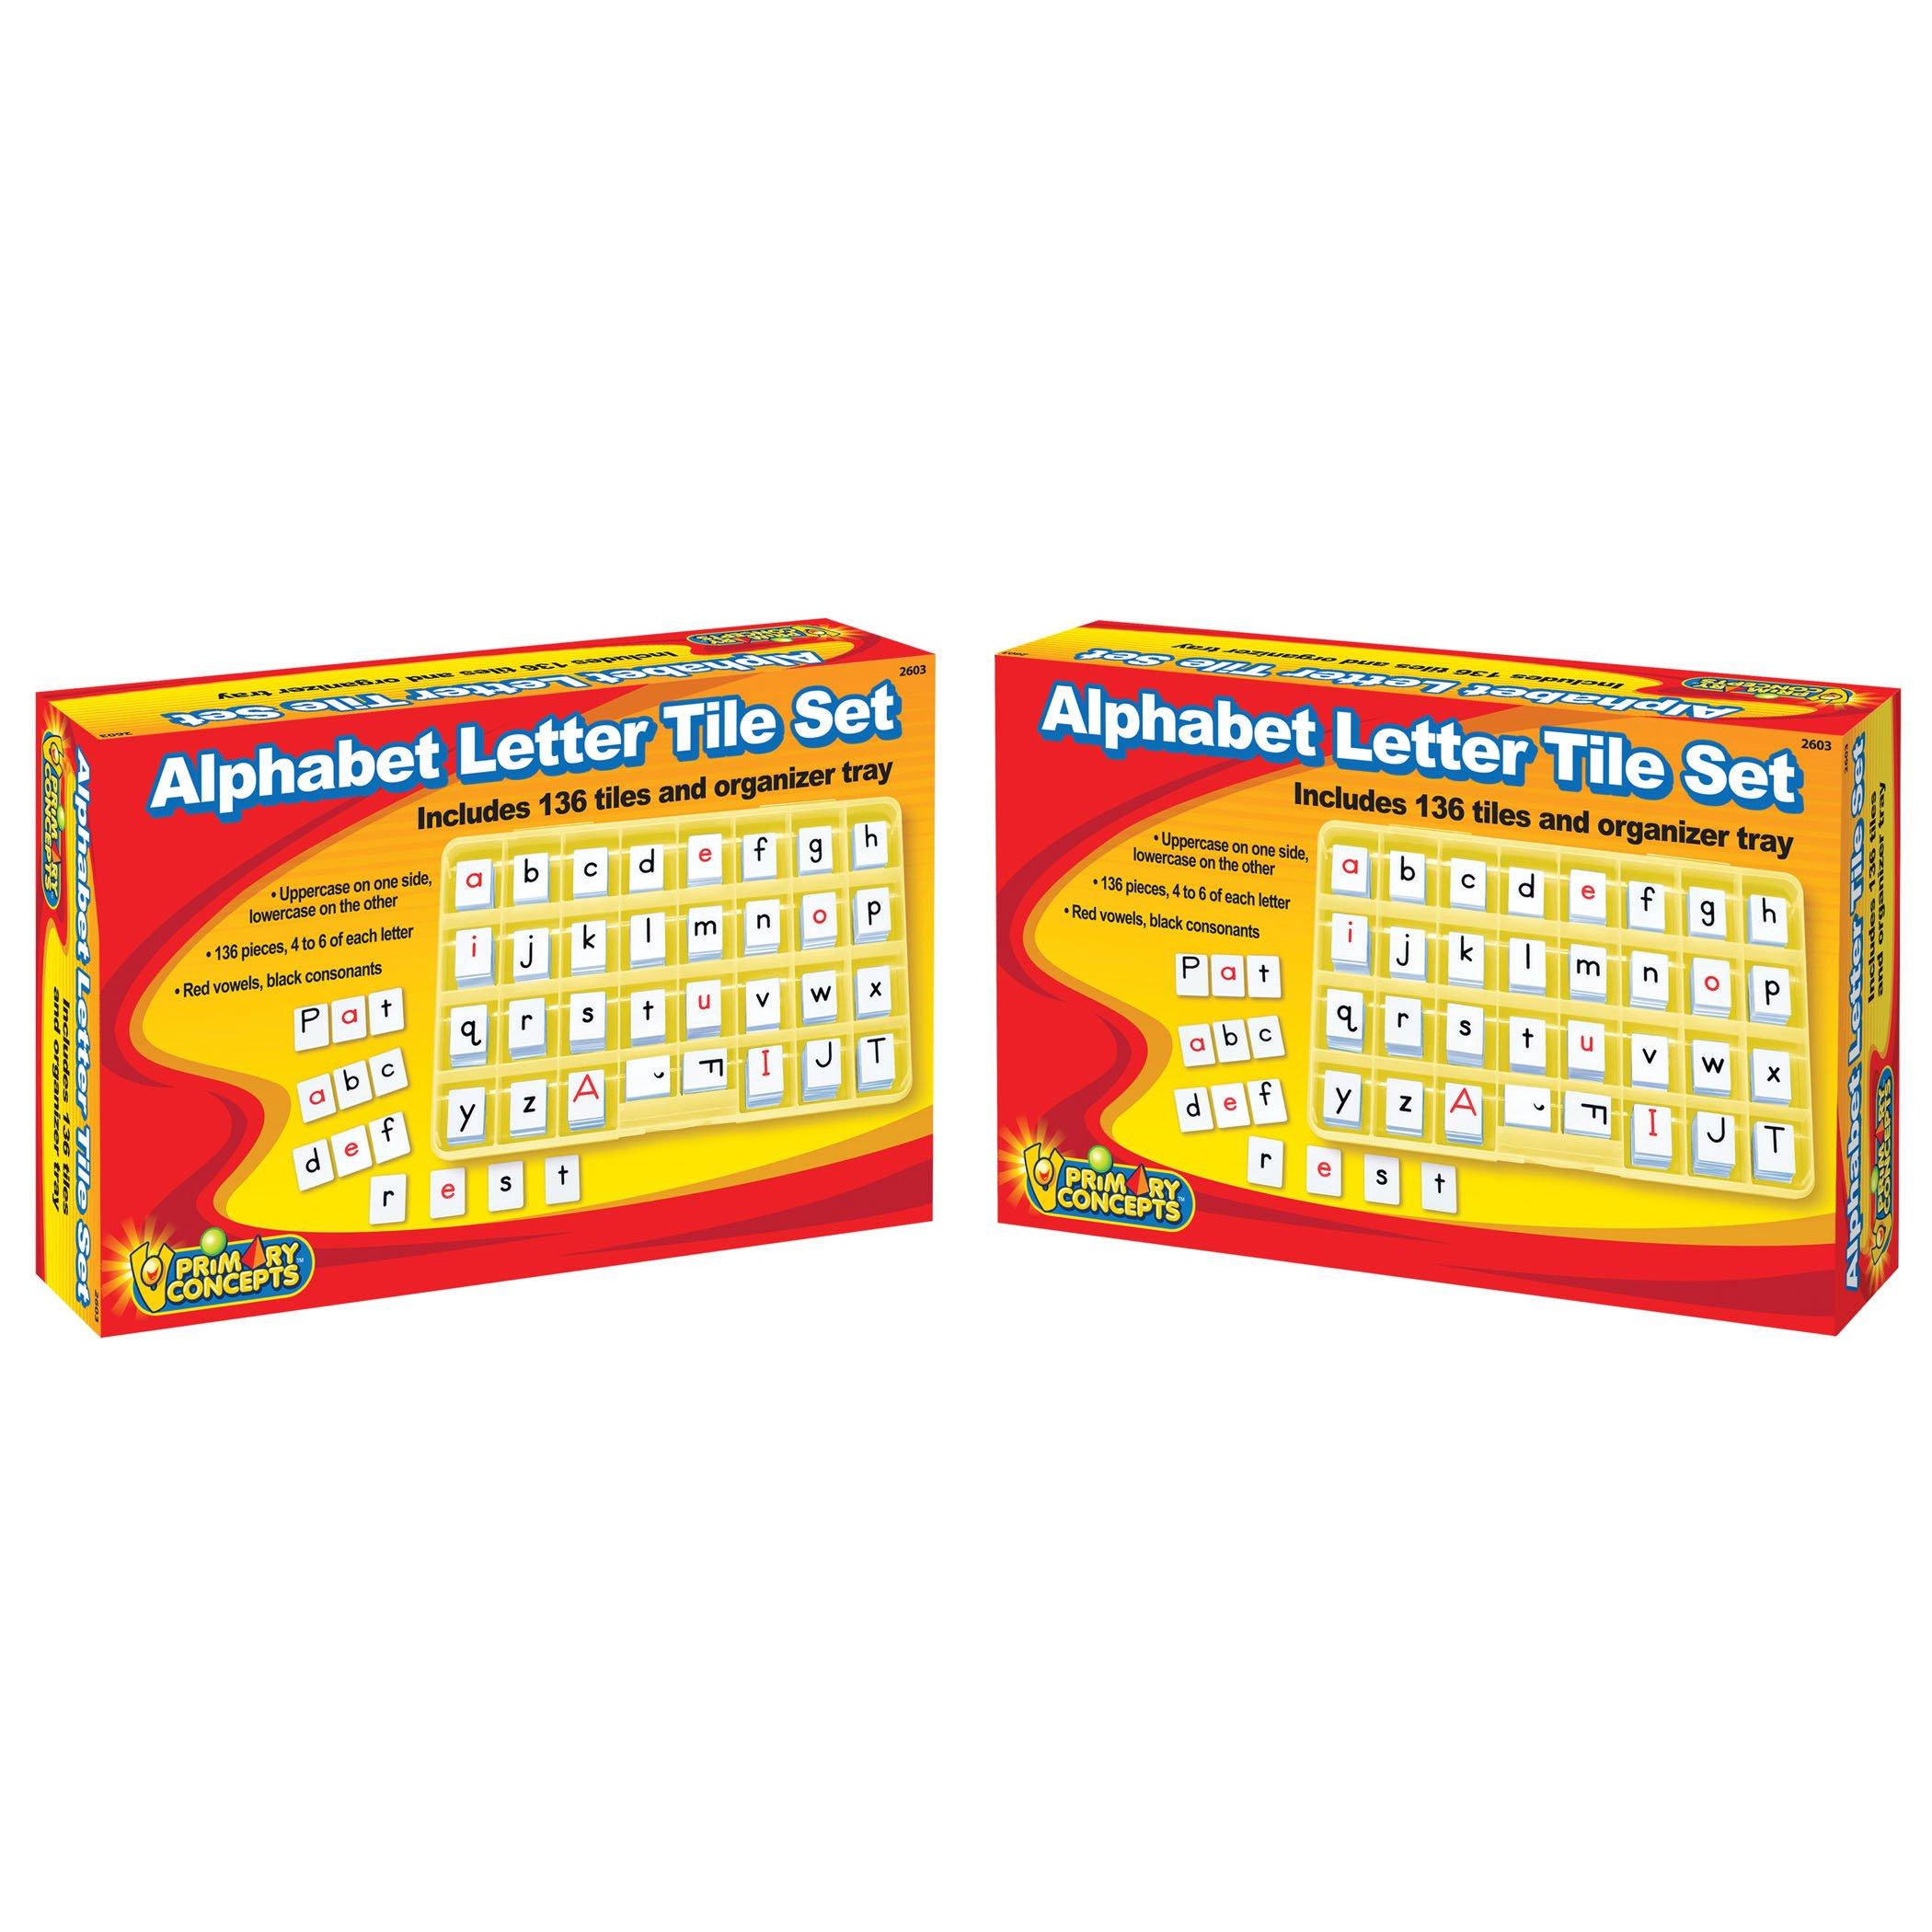 Primary Concepts, Inc Alphabet Letter Tile Set Learning Kit